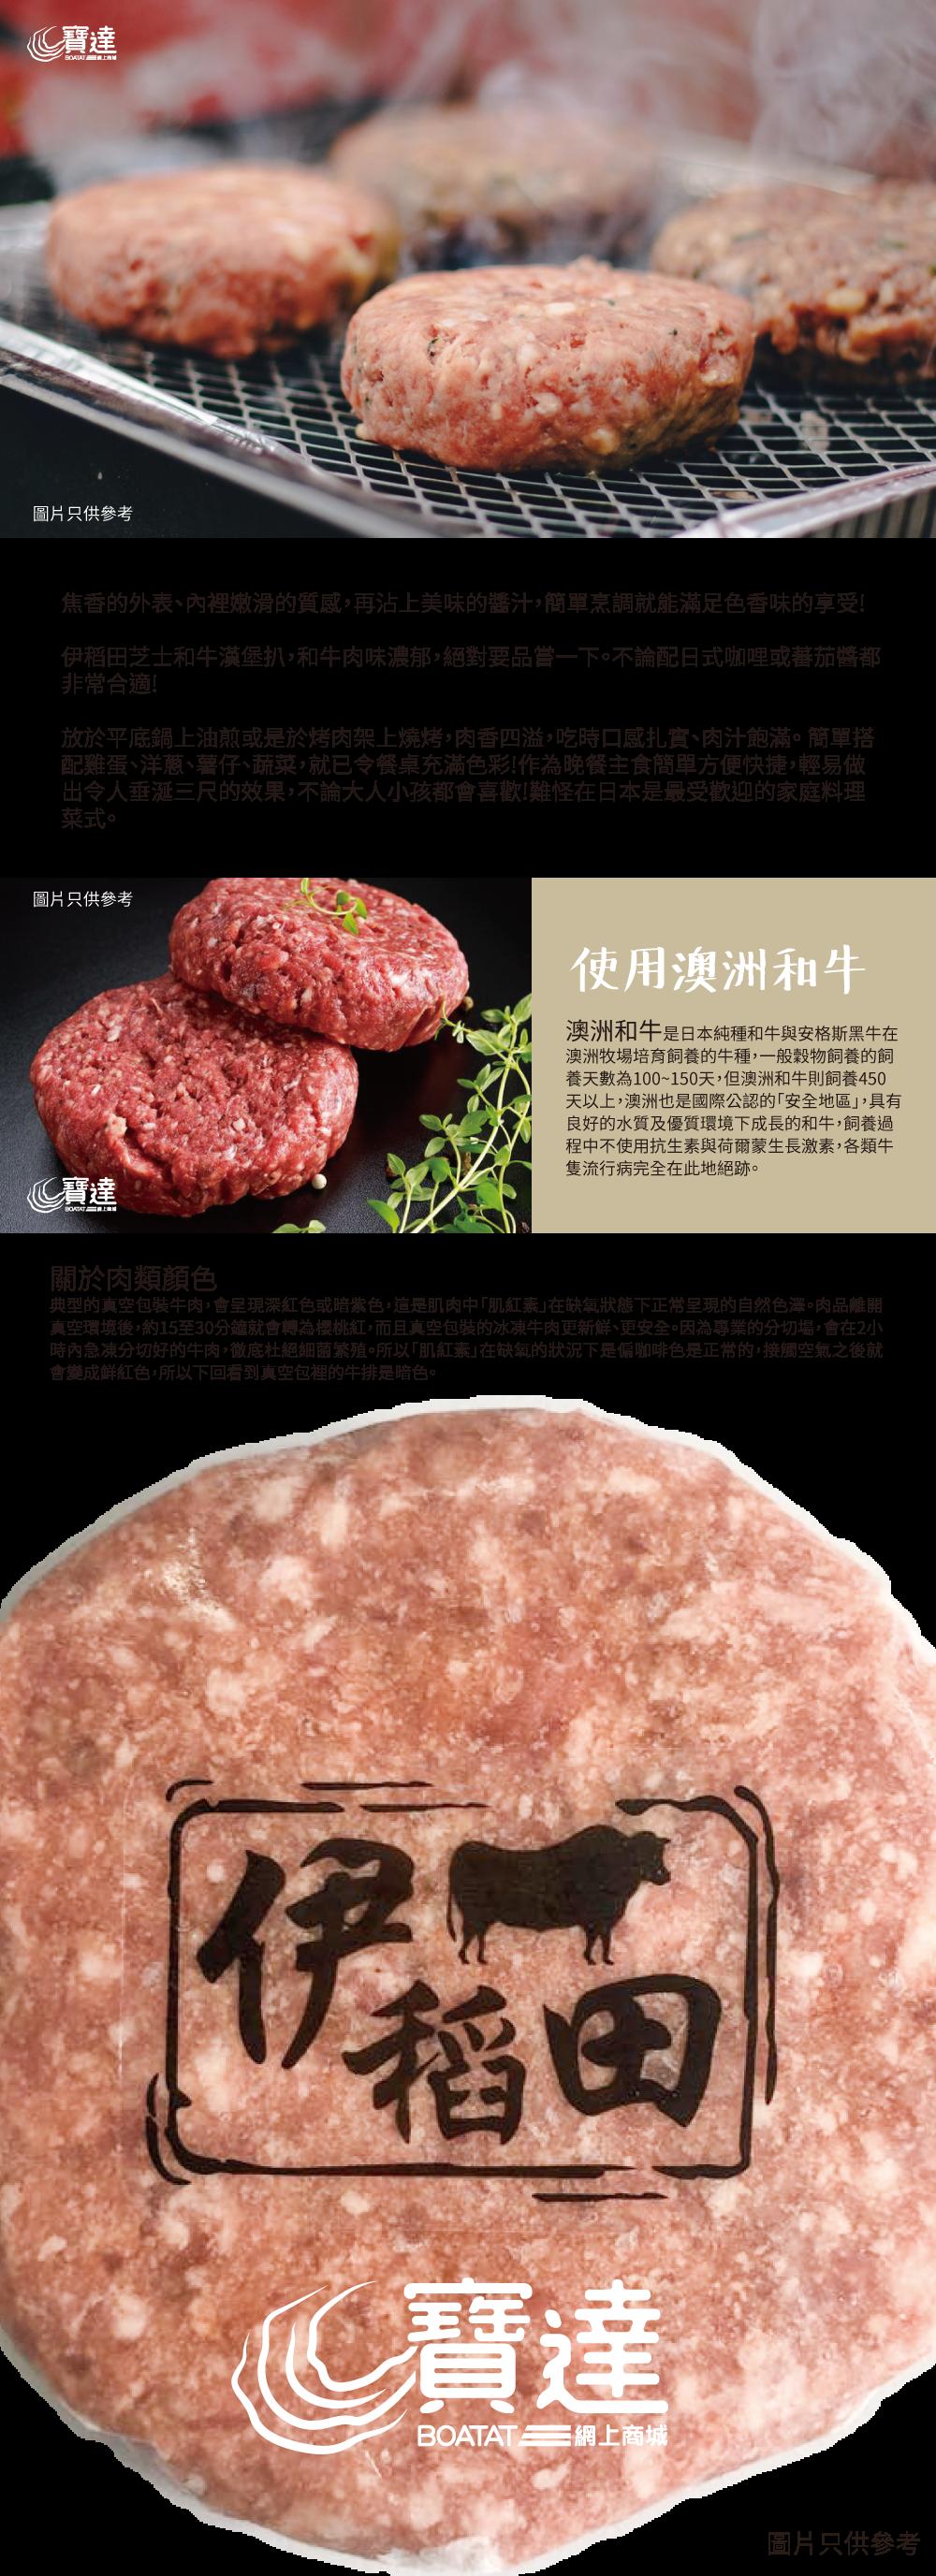 aus-hamburger-inner.png